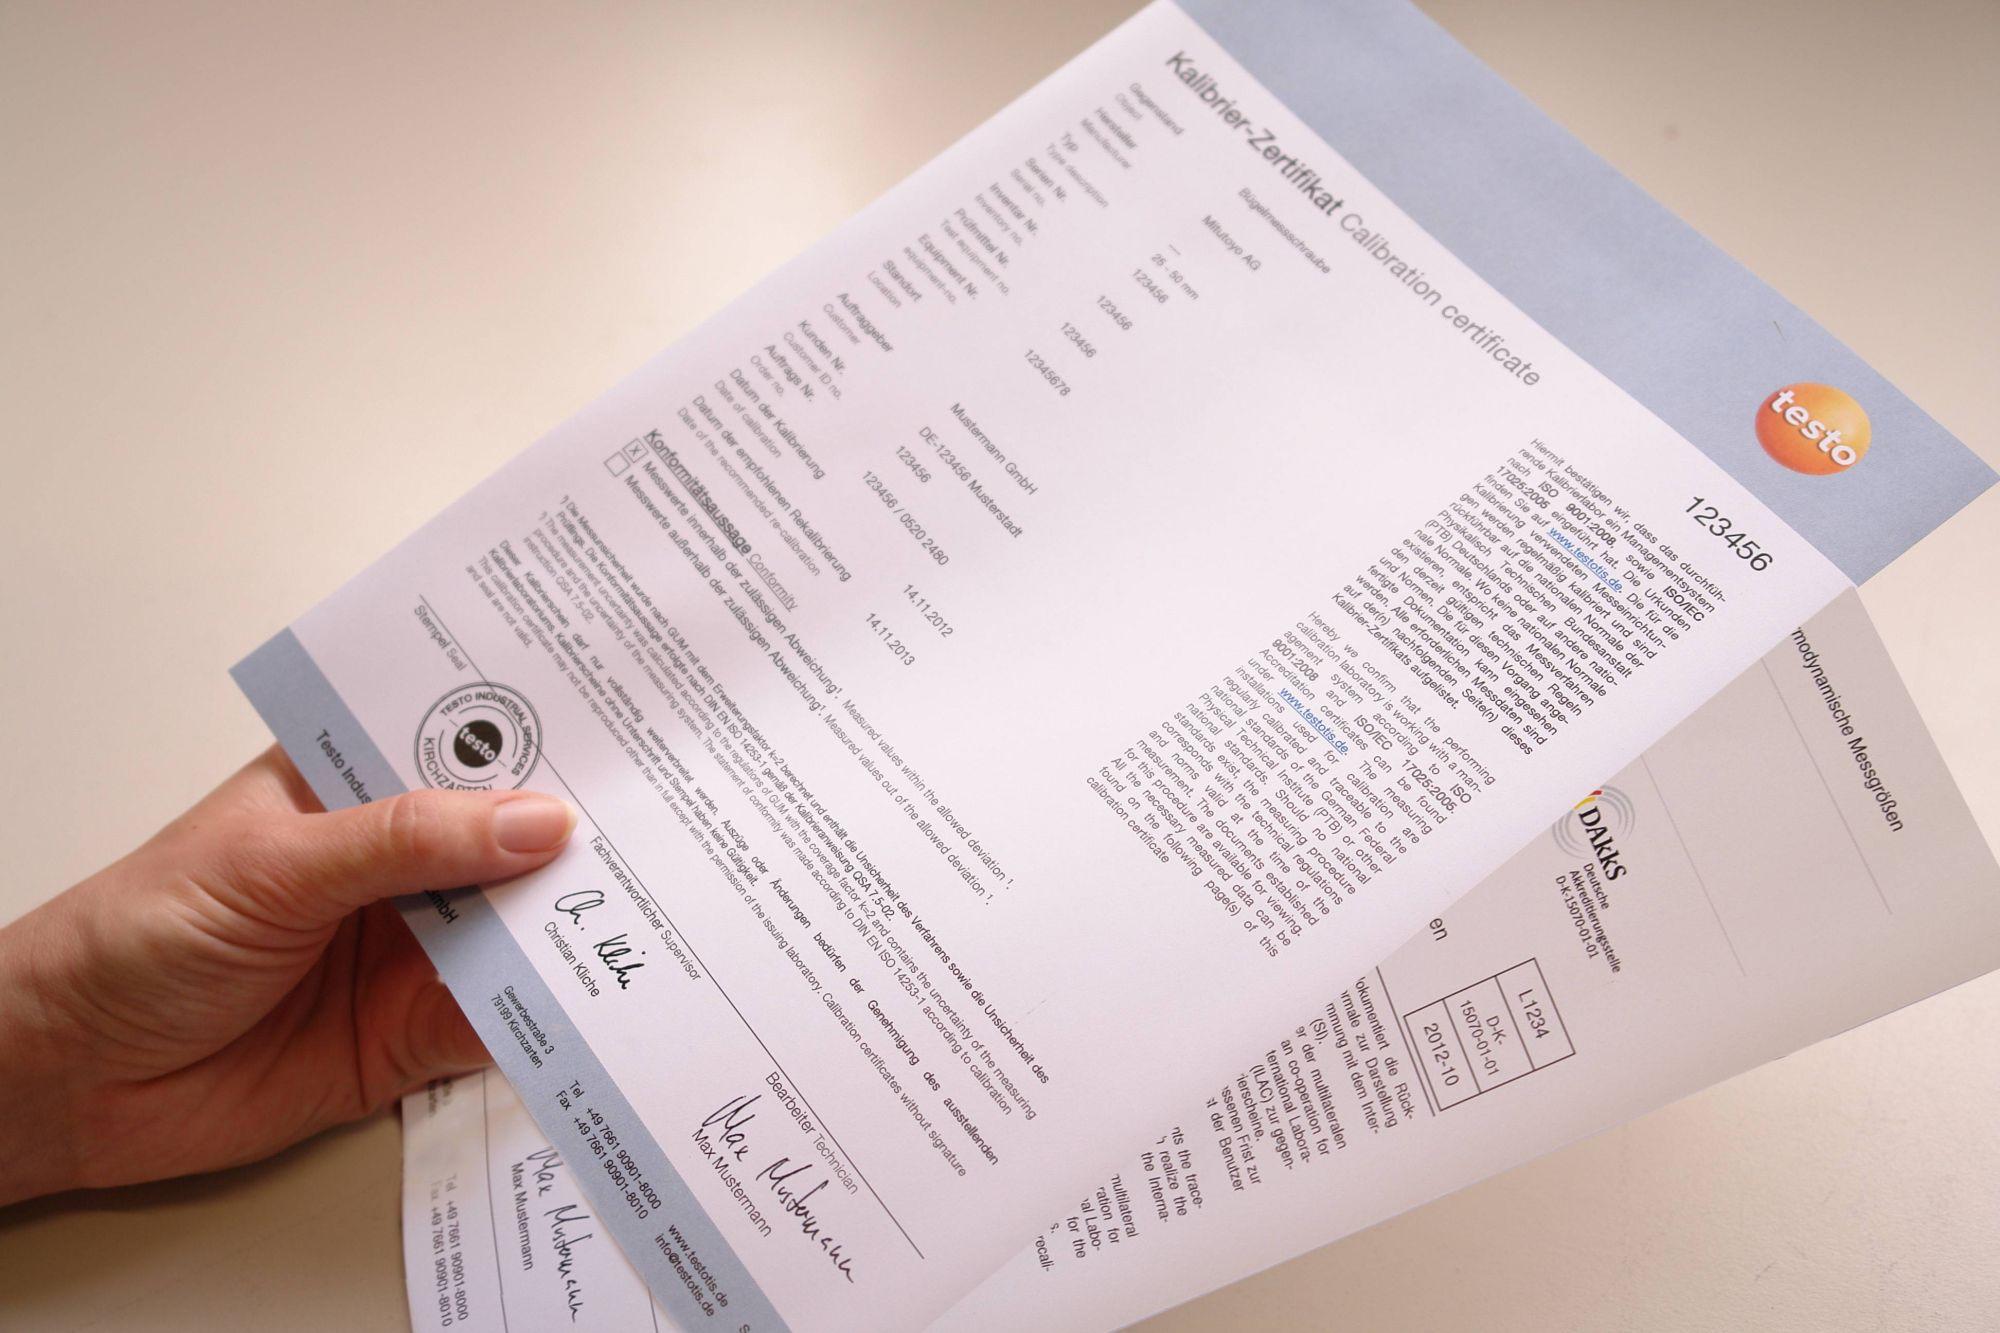 Das Kalibrierzertifikat